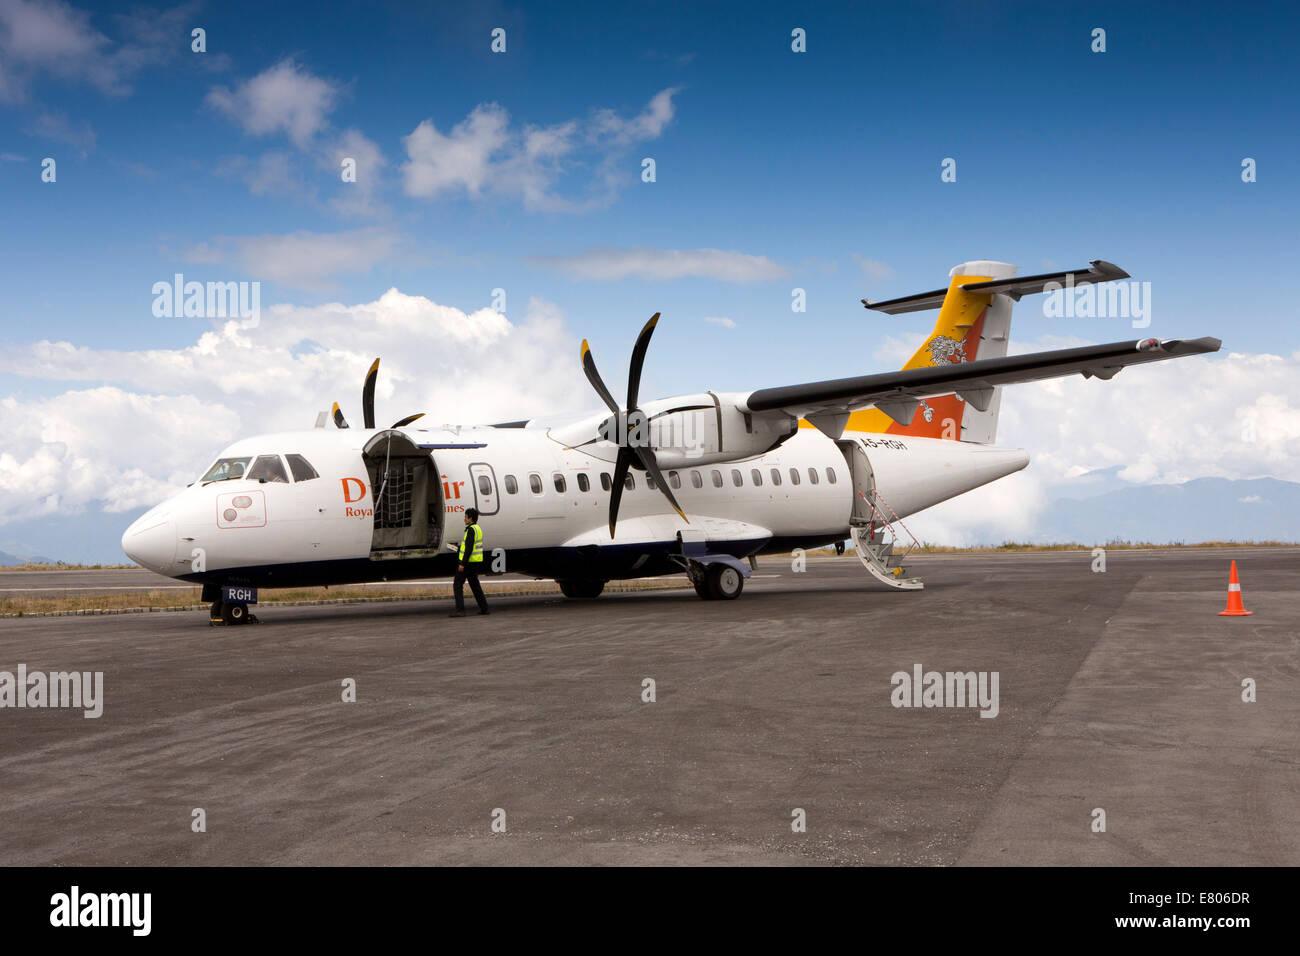 Blue apron engineering - Eastern Bhutan Yongphula Airport Druk Air Atr 42 500 Aircraft On Apron At